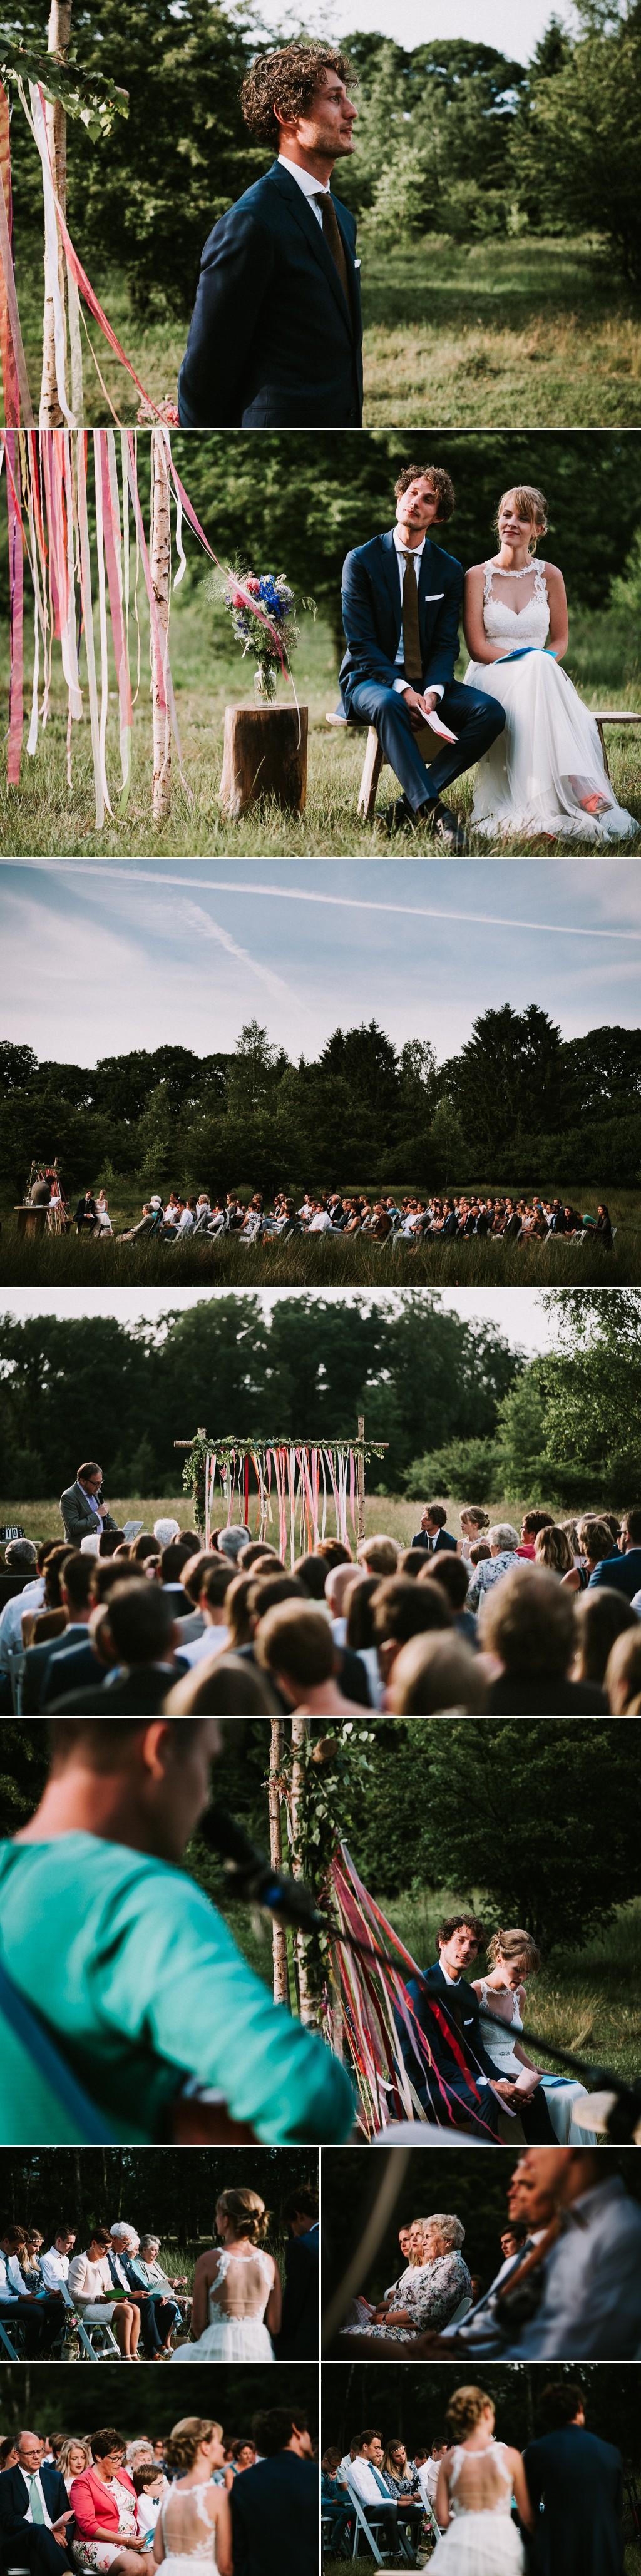 trouwfotograaf-rotterdam-trouwen-in-het-bos-arnhem-fotografie-steef-utama-w-w-11